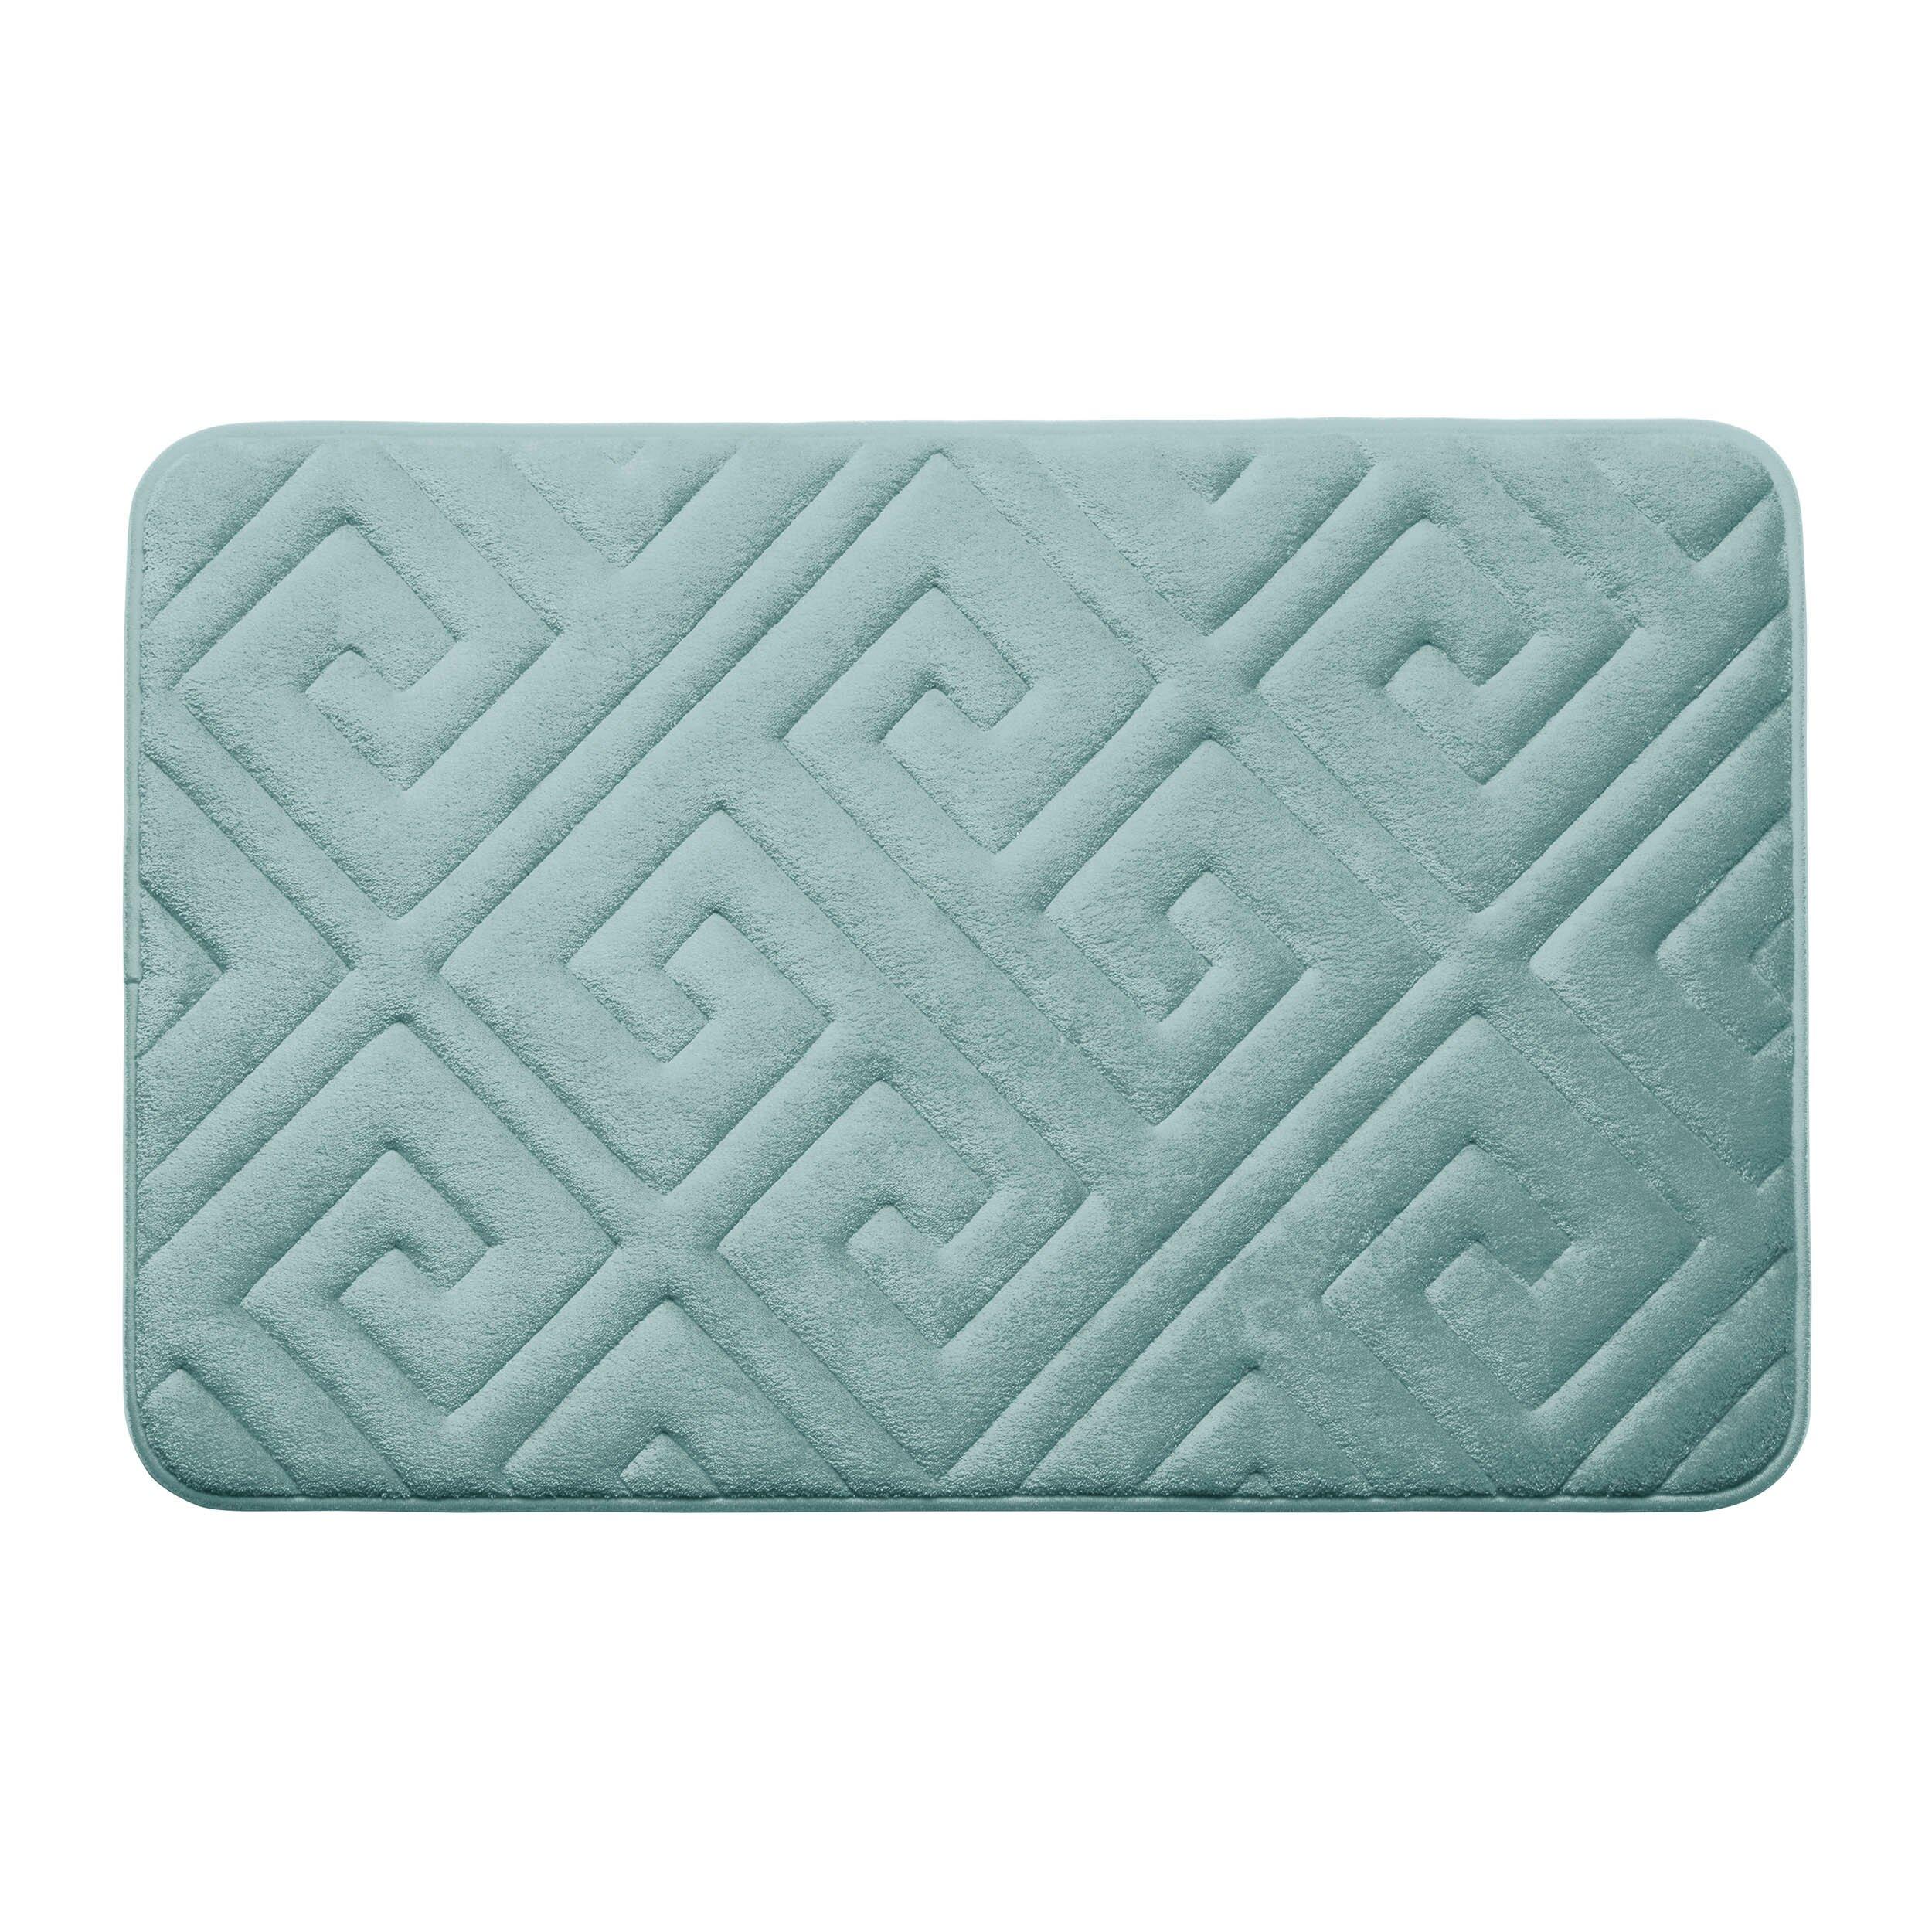 Bath Studio Caicos Premium Micro Plush Memory Foam Bath